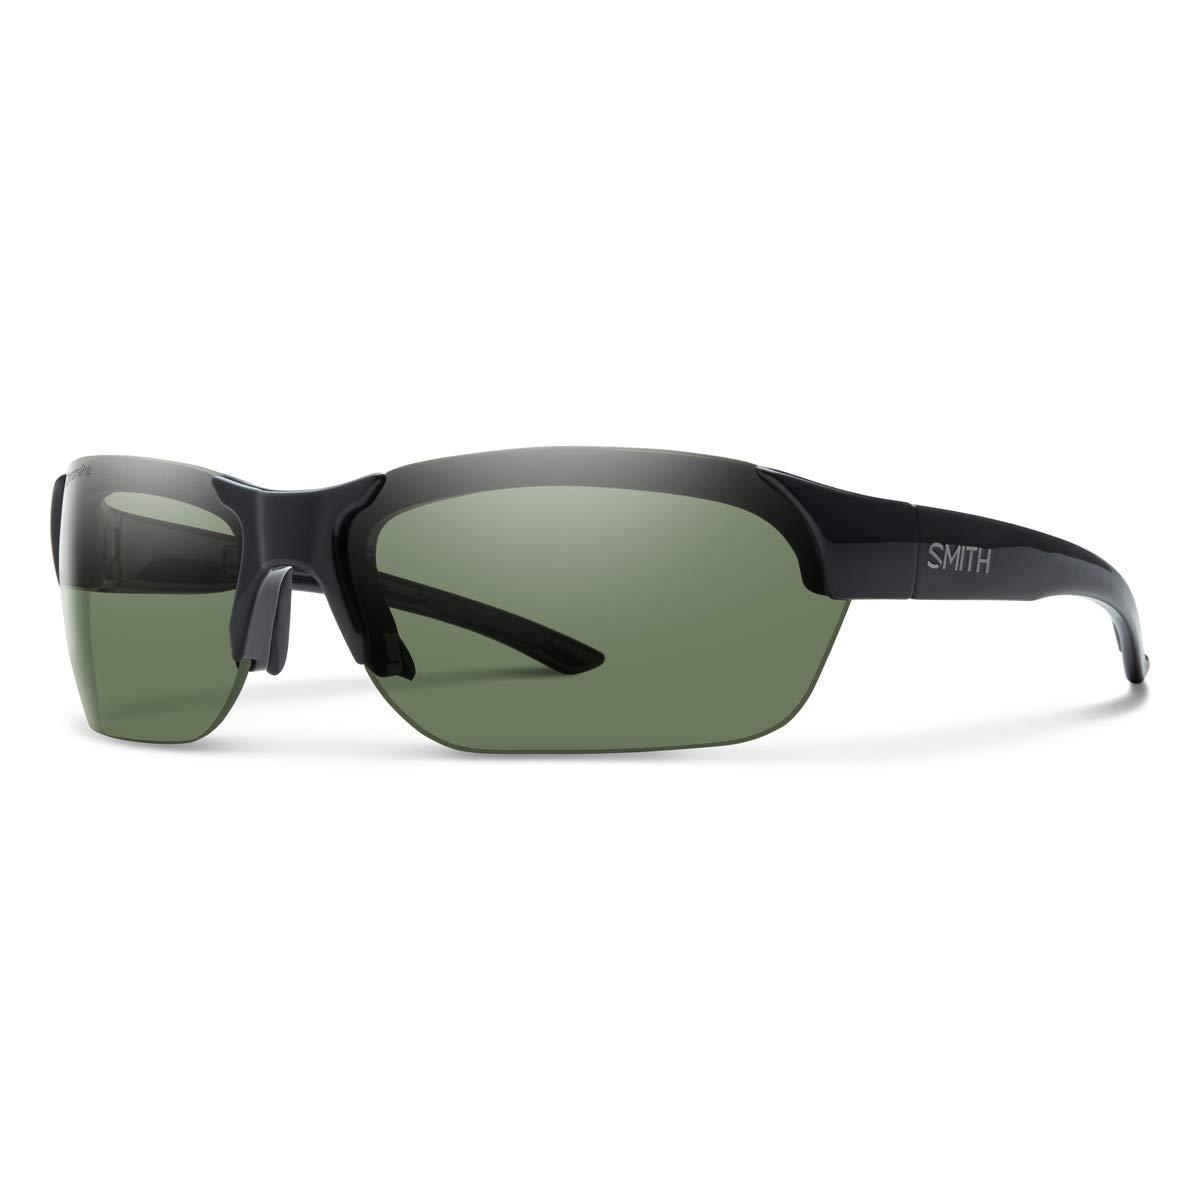 Mens Smith Envoy ChromaPop Polarized Sunglasses